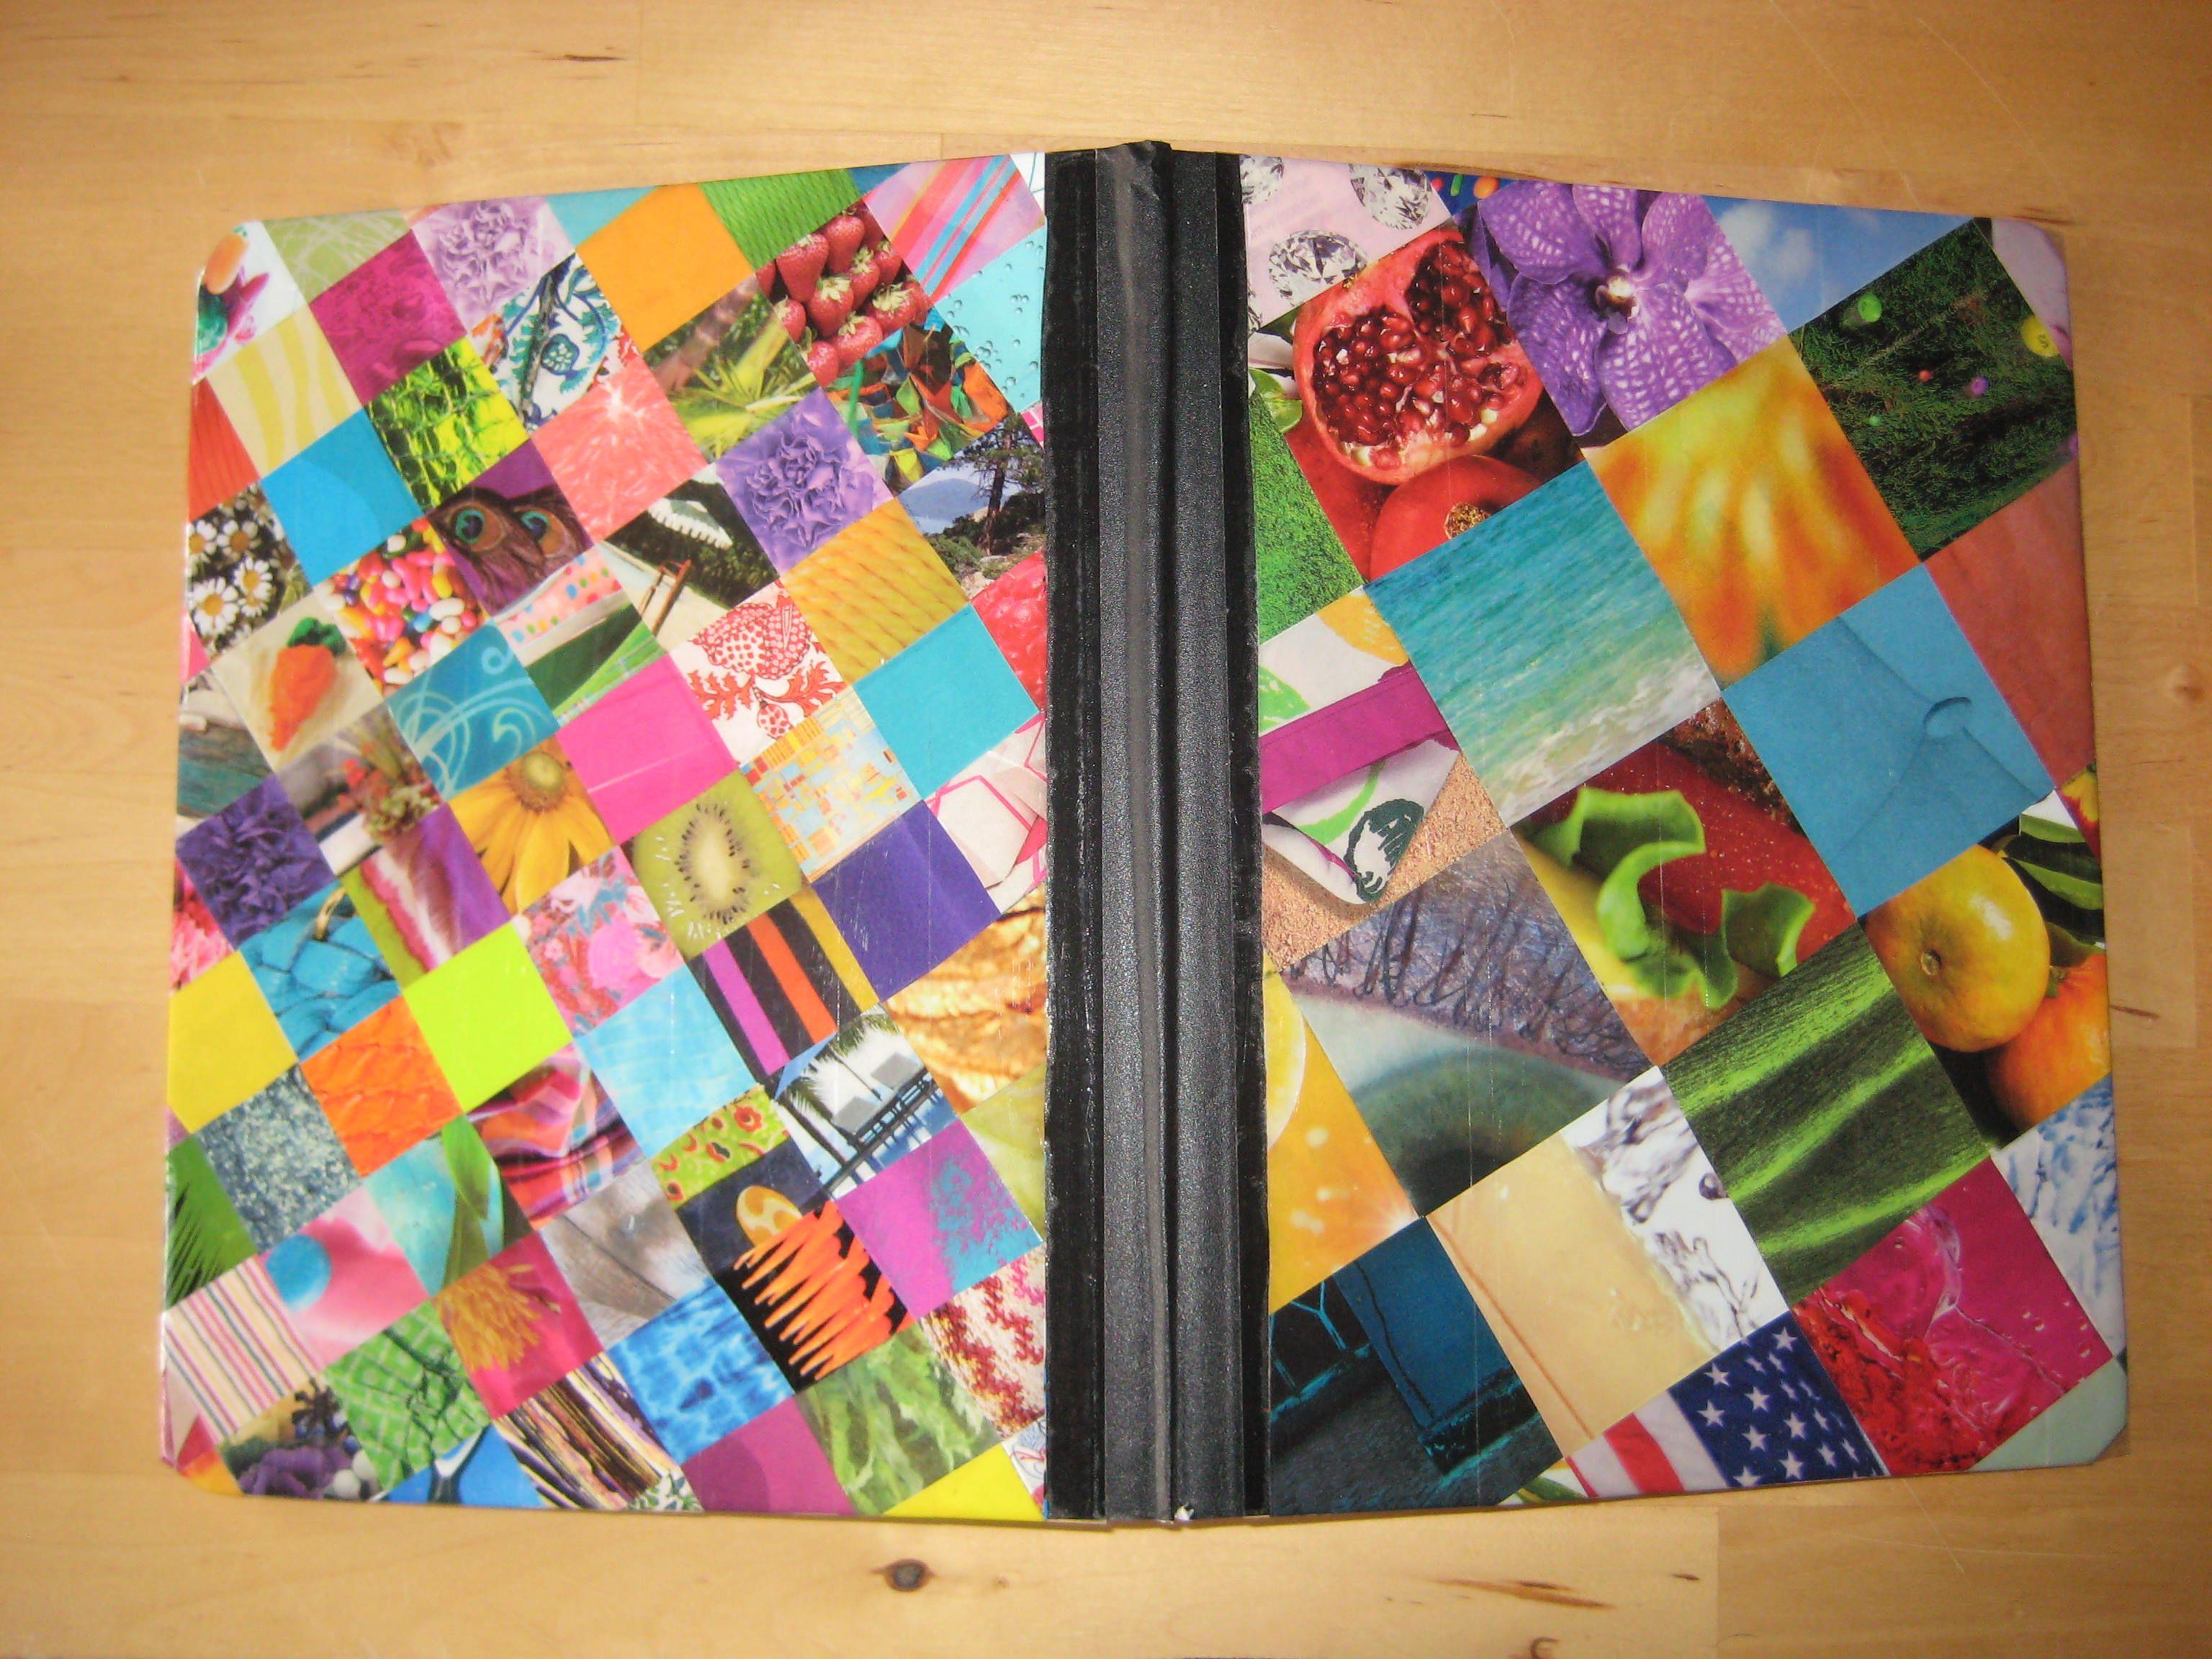 Magazine squares glued onto a composition notebook ...